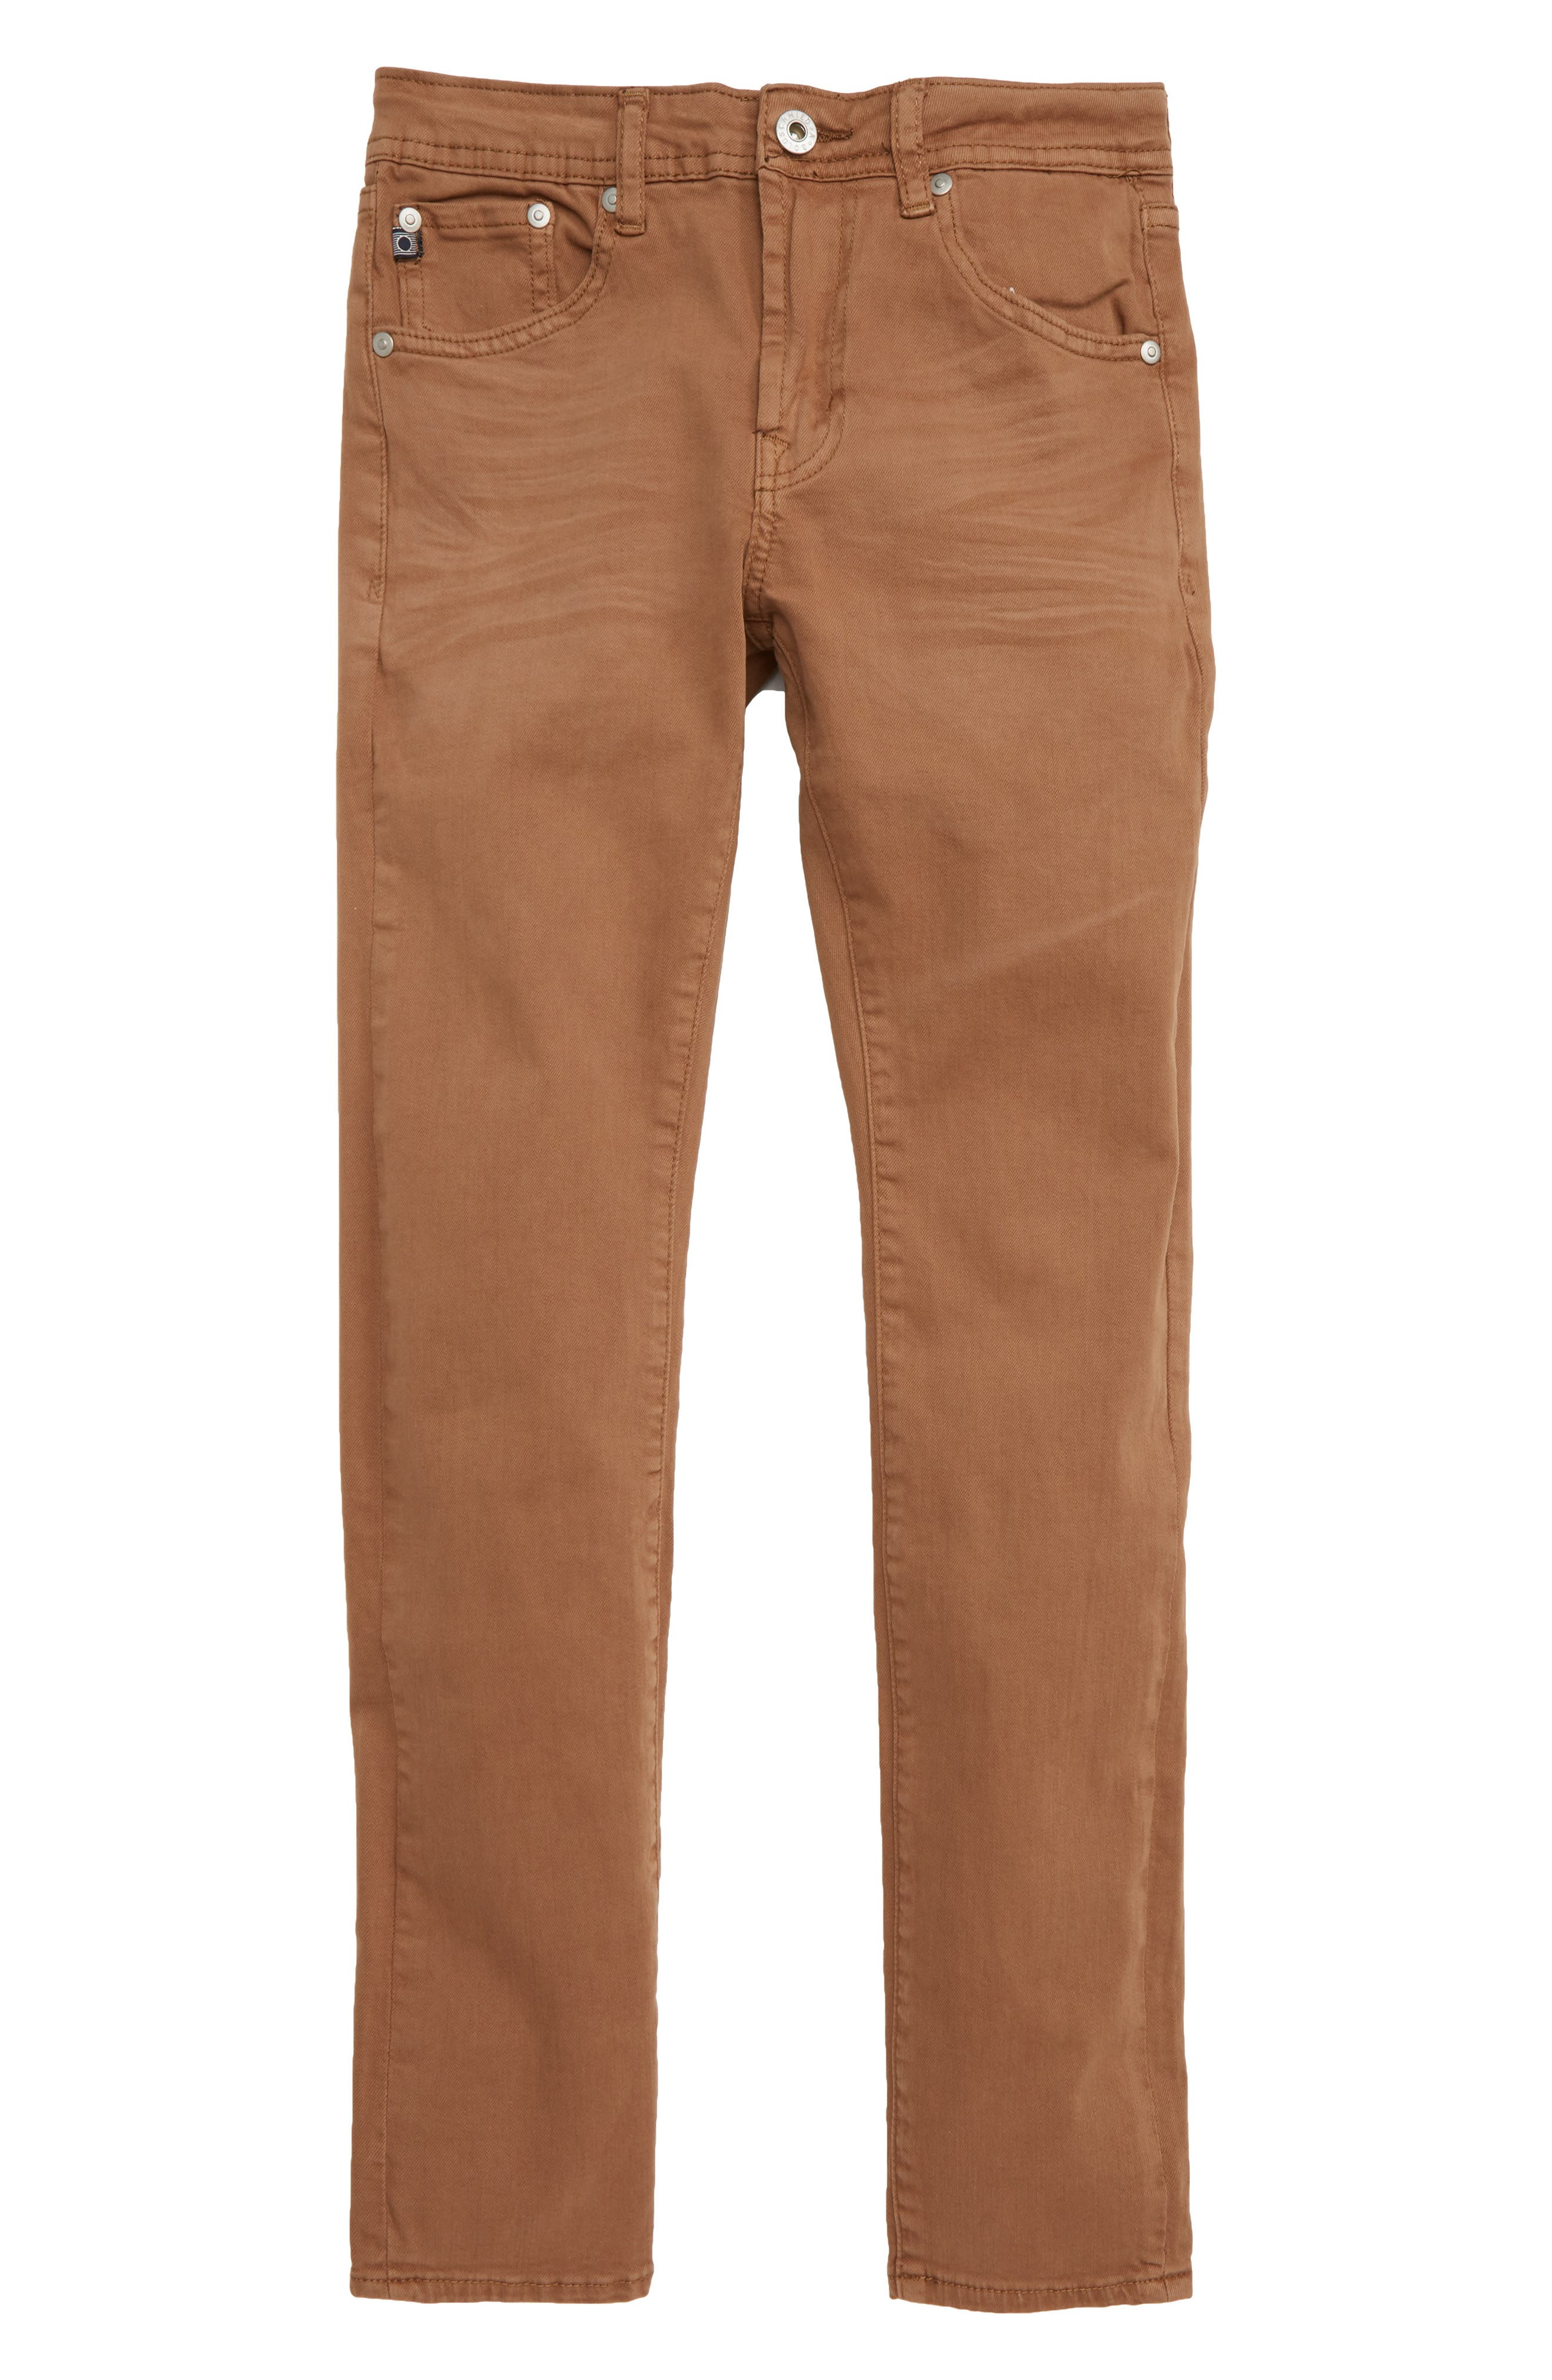 adriano goldschmied kids The Ryker Slim Skinny Jeans,                         Main,                         color, MUSTARD GOLDEN OLIVE